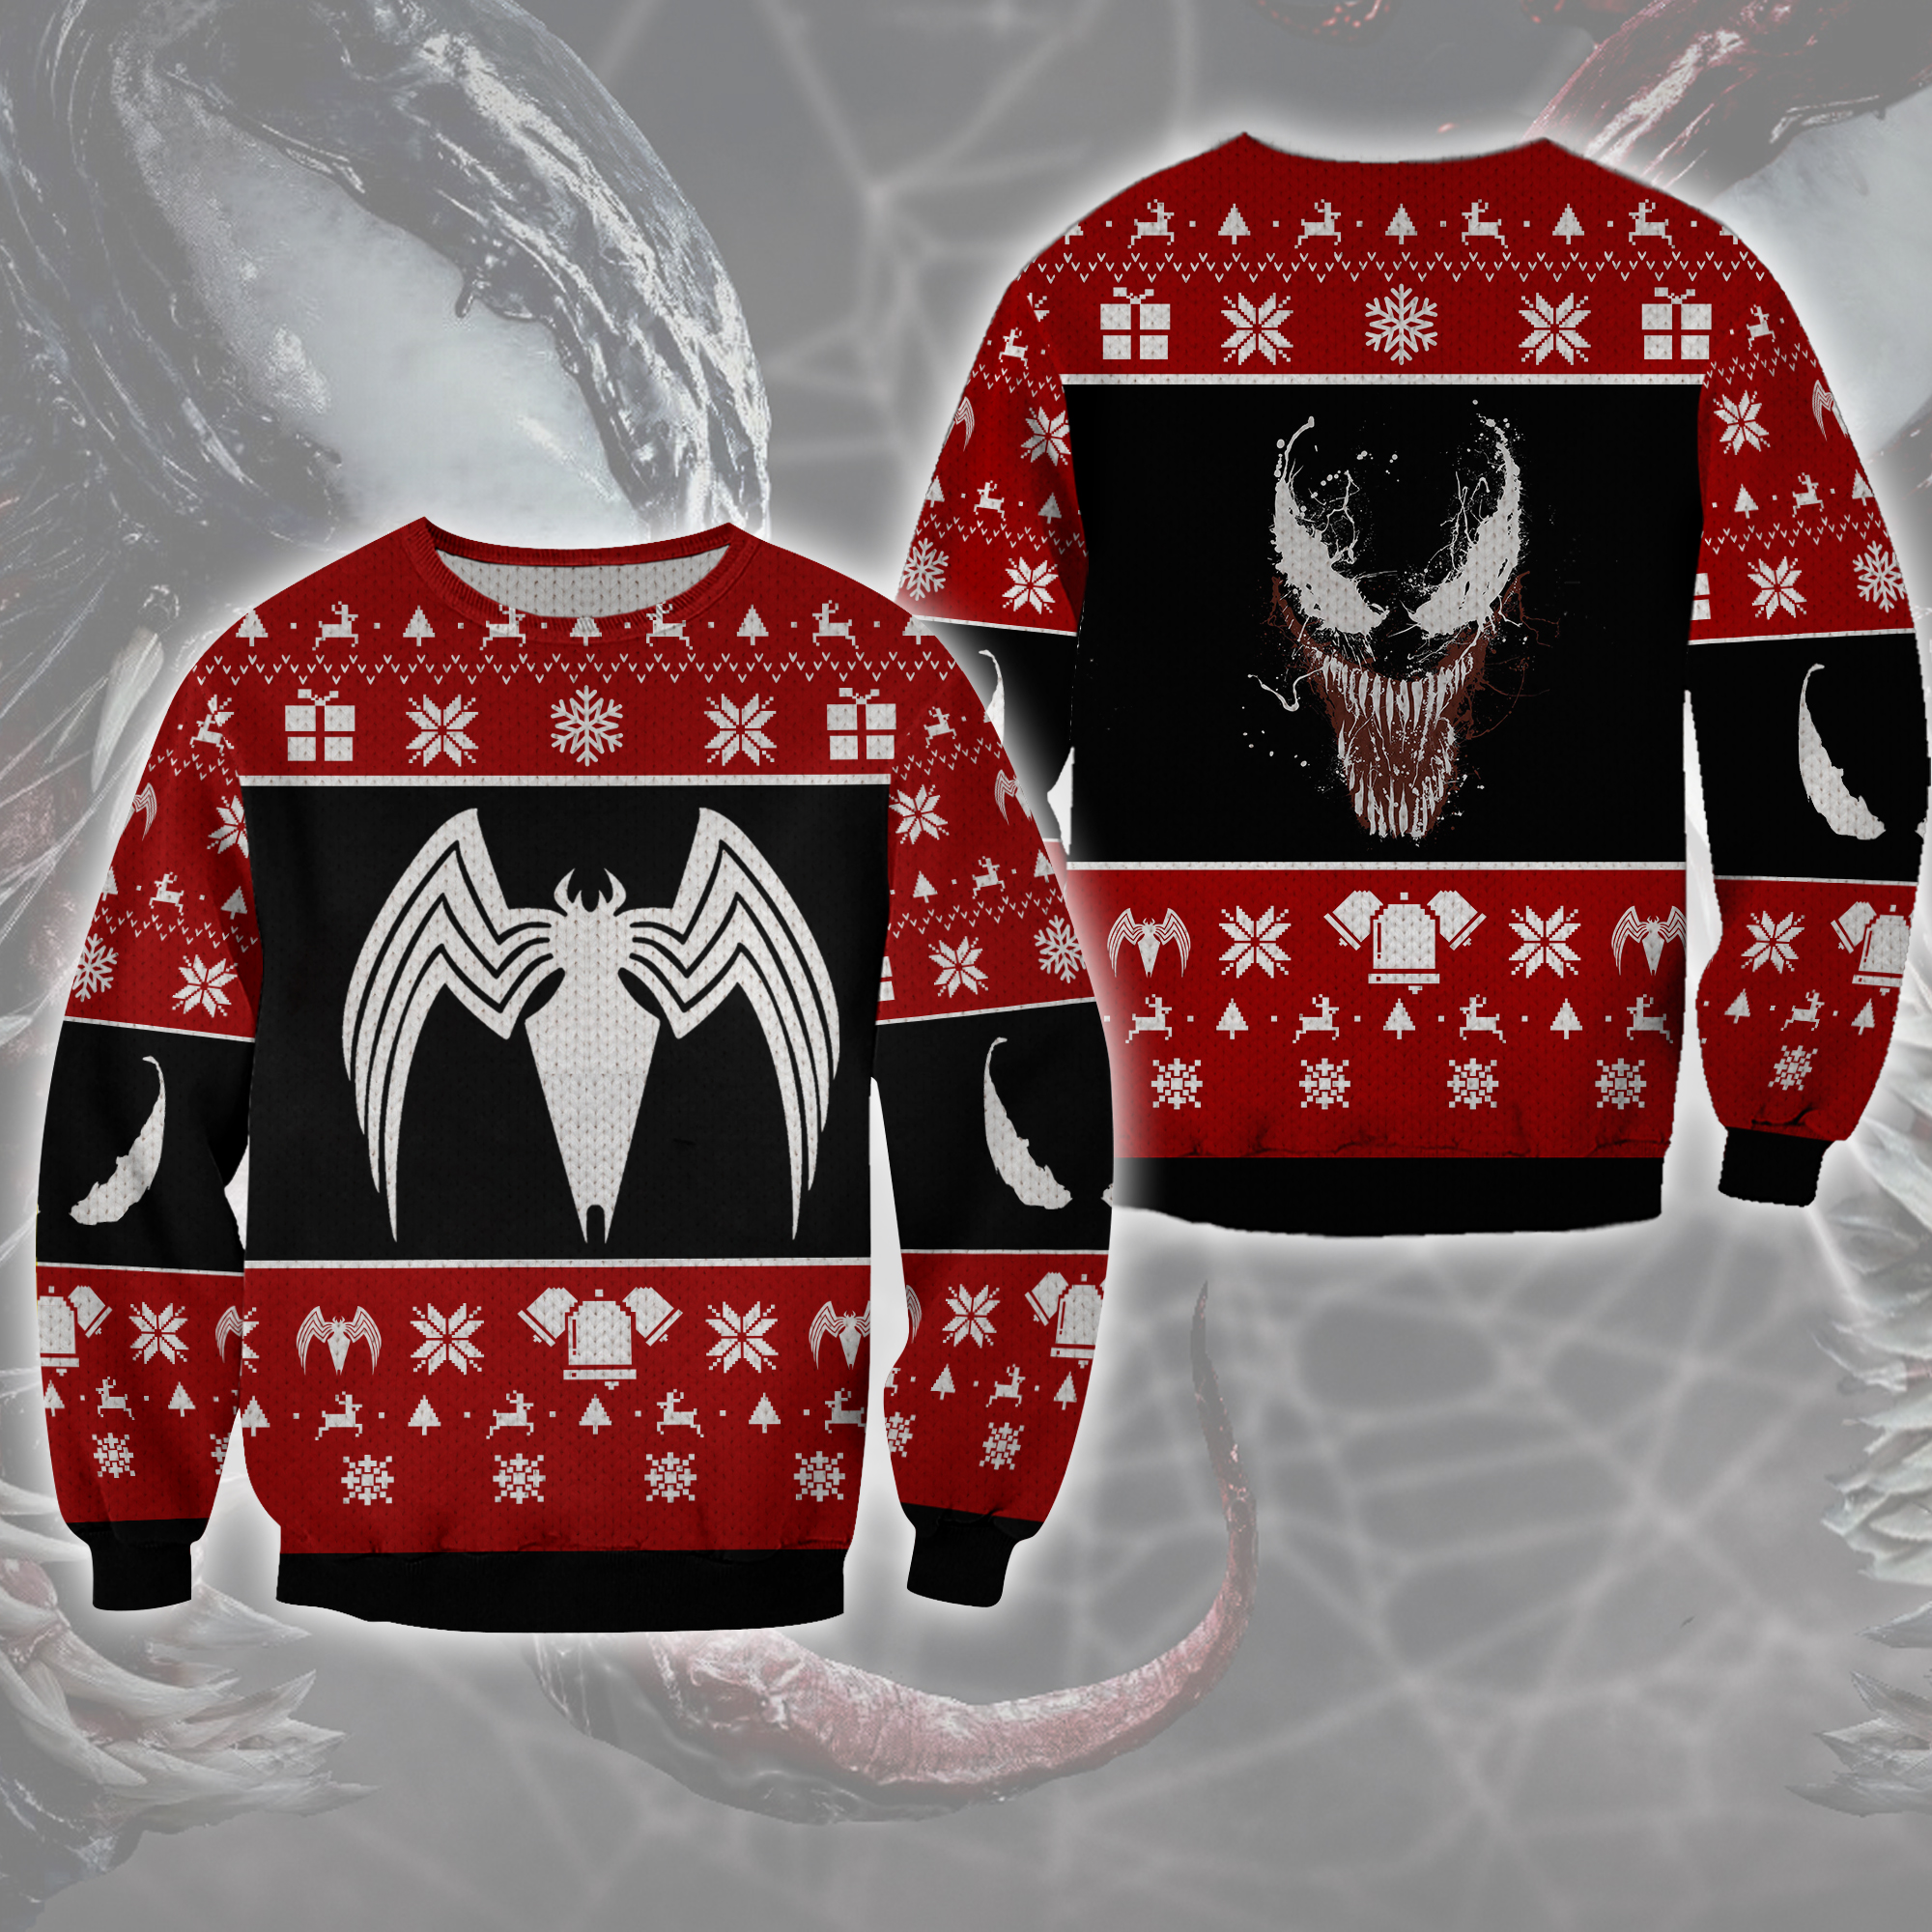 We are Venom Ugly Bat Sweater Christmas